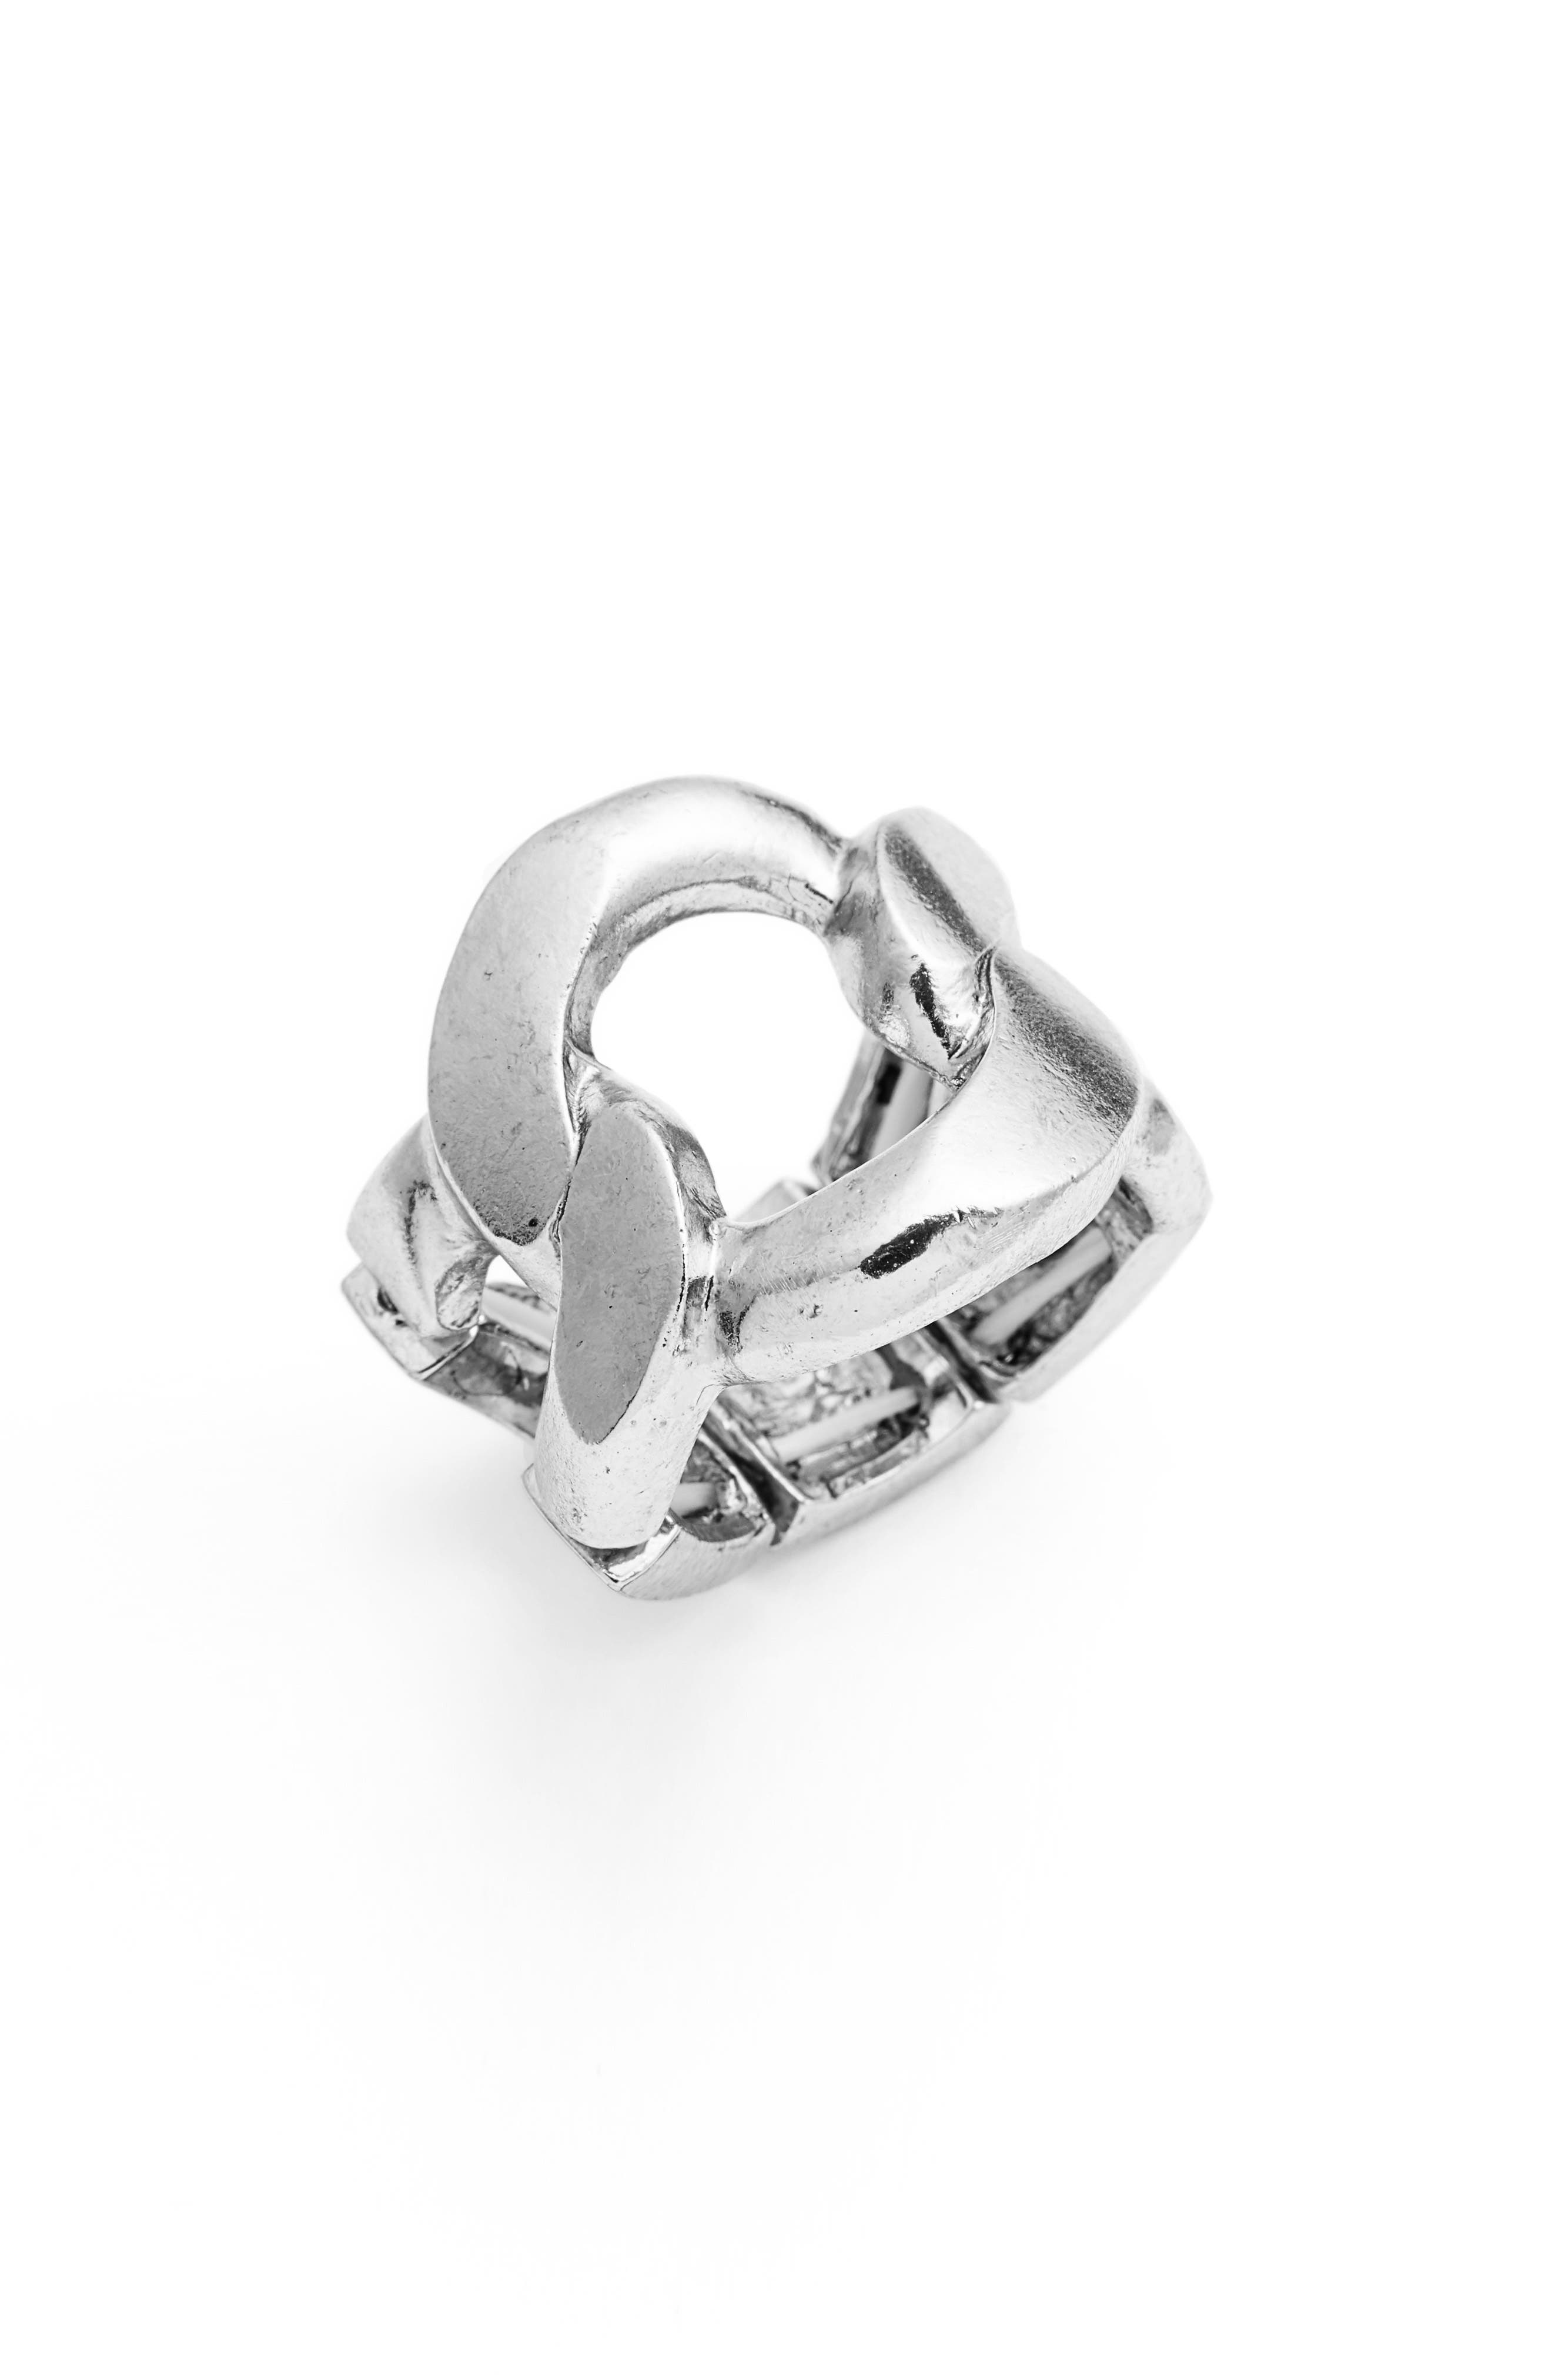 KARINE SULTAN Adjustable Ring, Main, color, SILVER